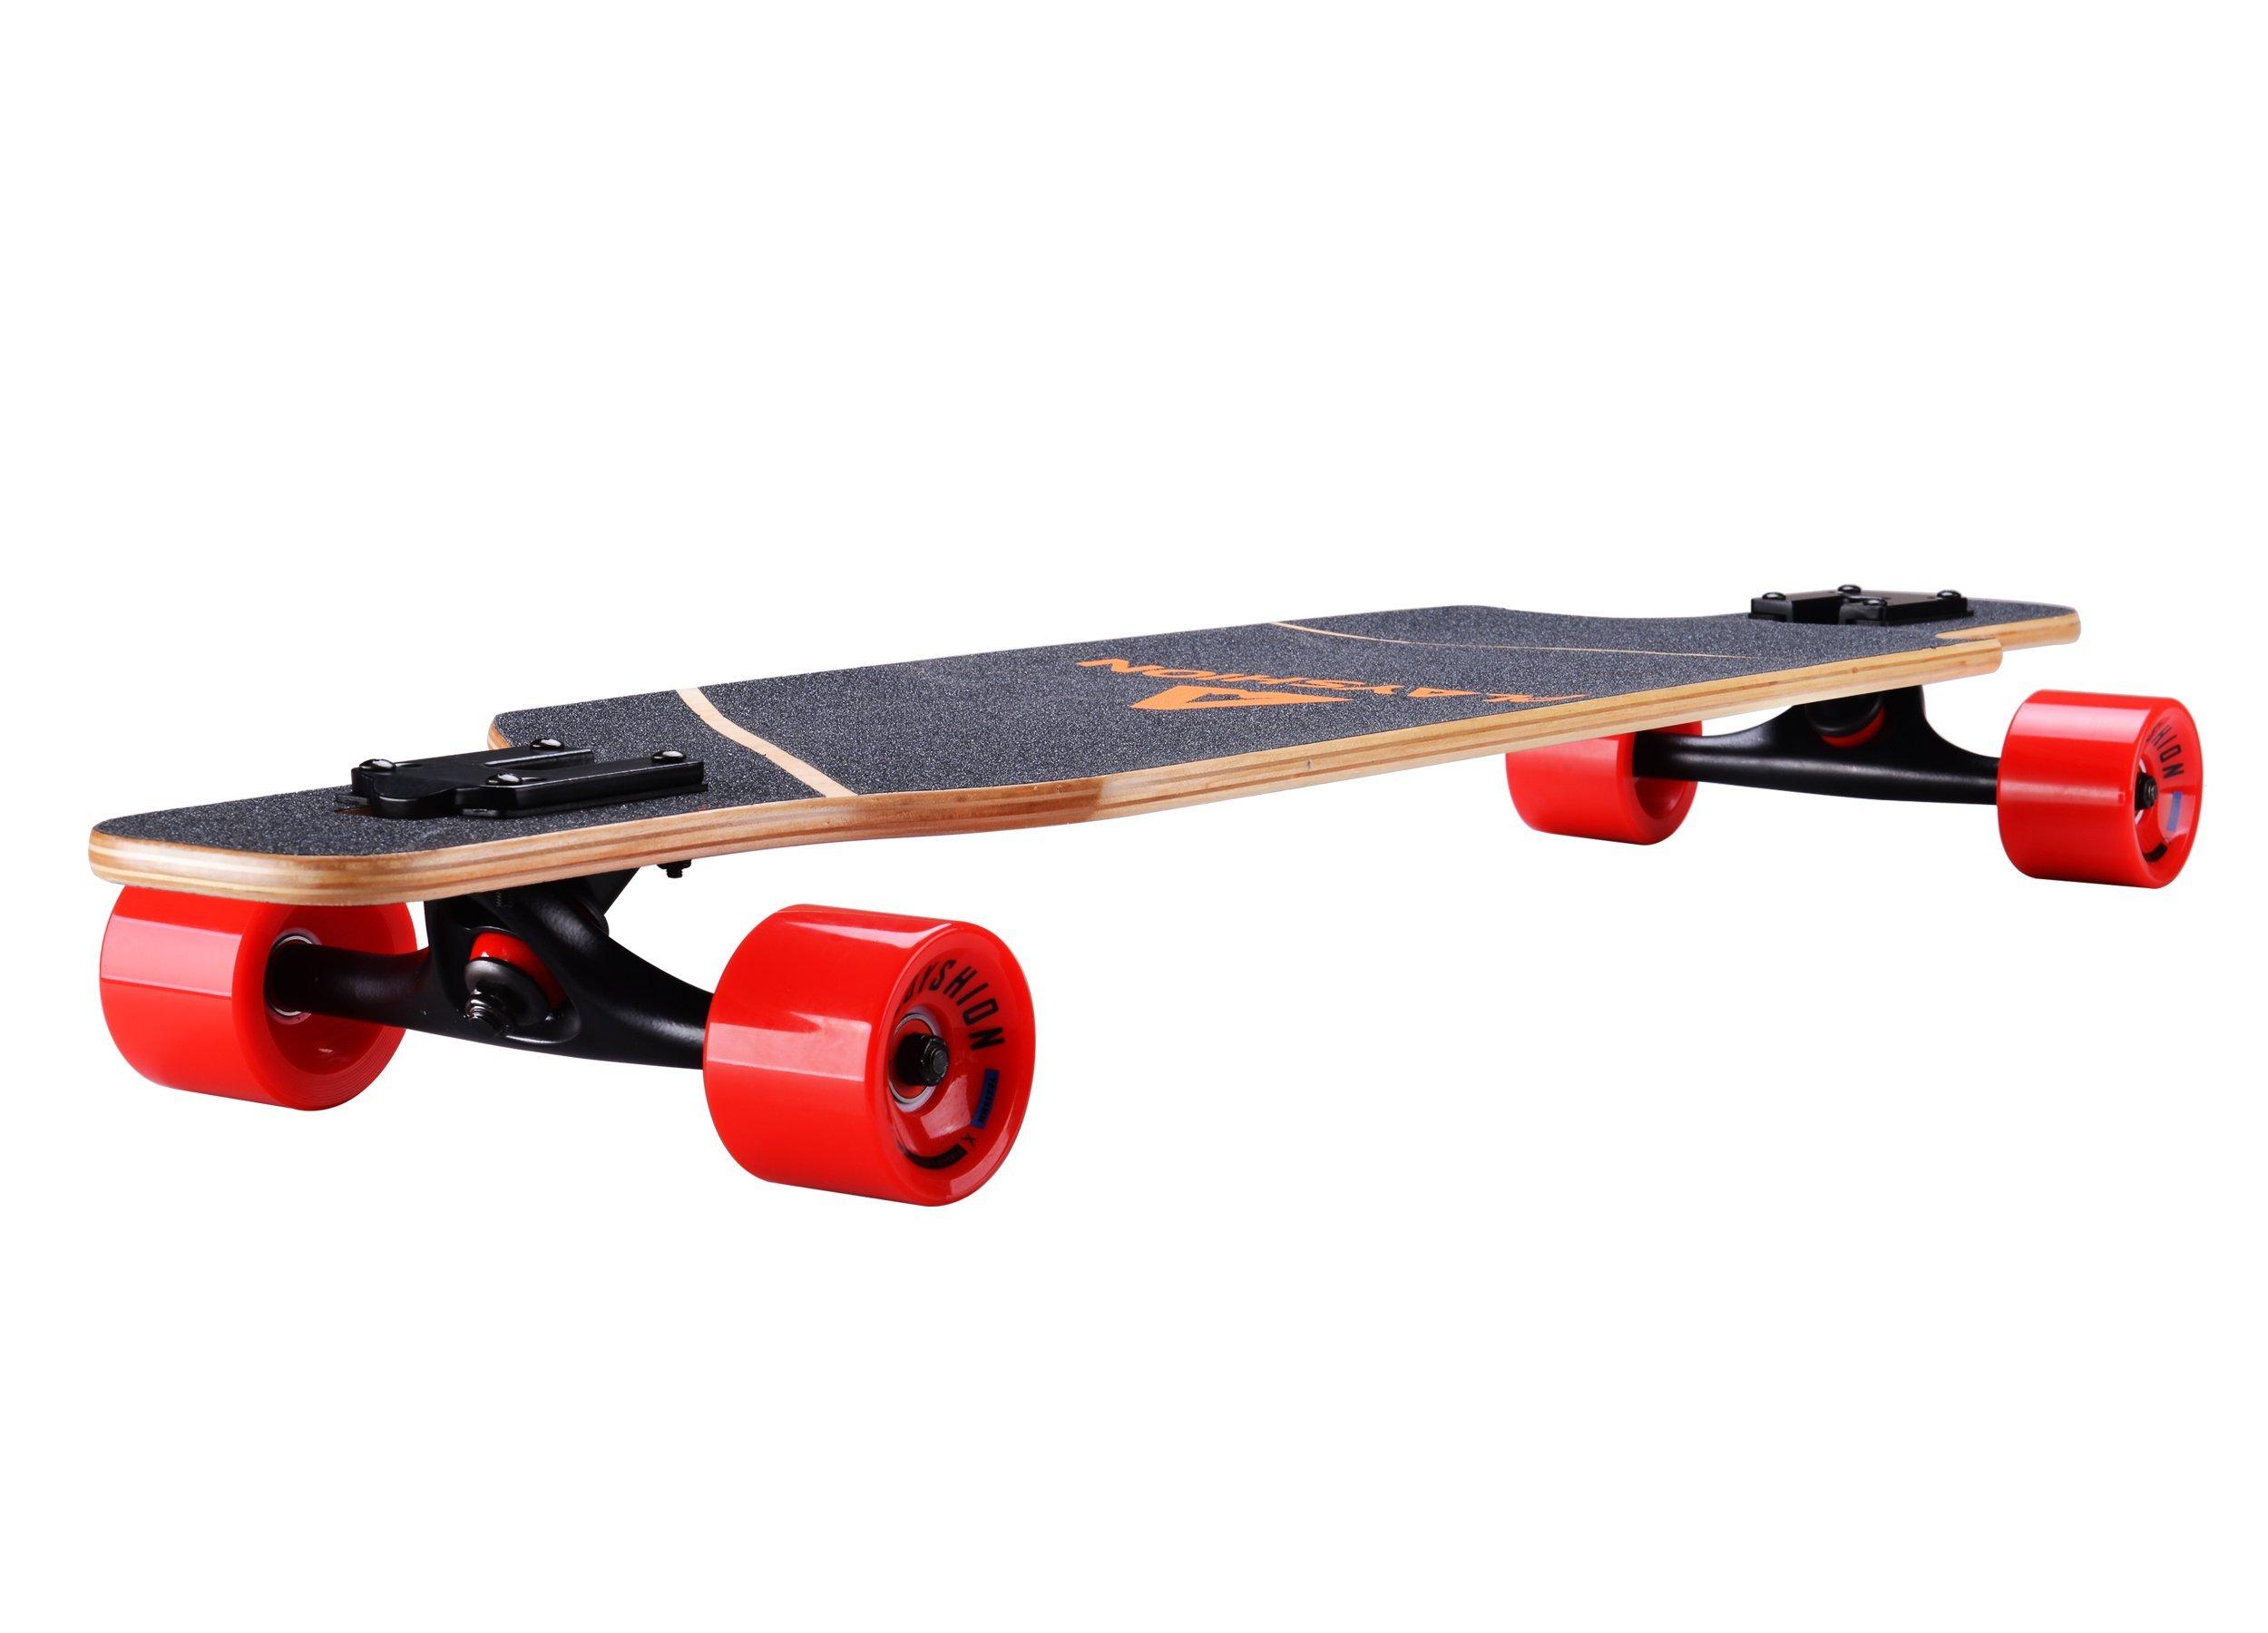 Playshion 39 Inch Drop Through Freestyle Longboard Skateboard Cruiser by Playshion (Image #4)